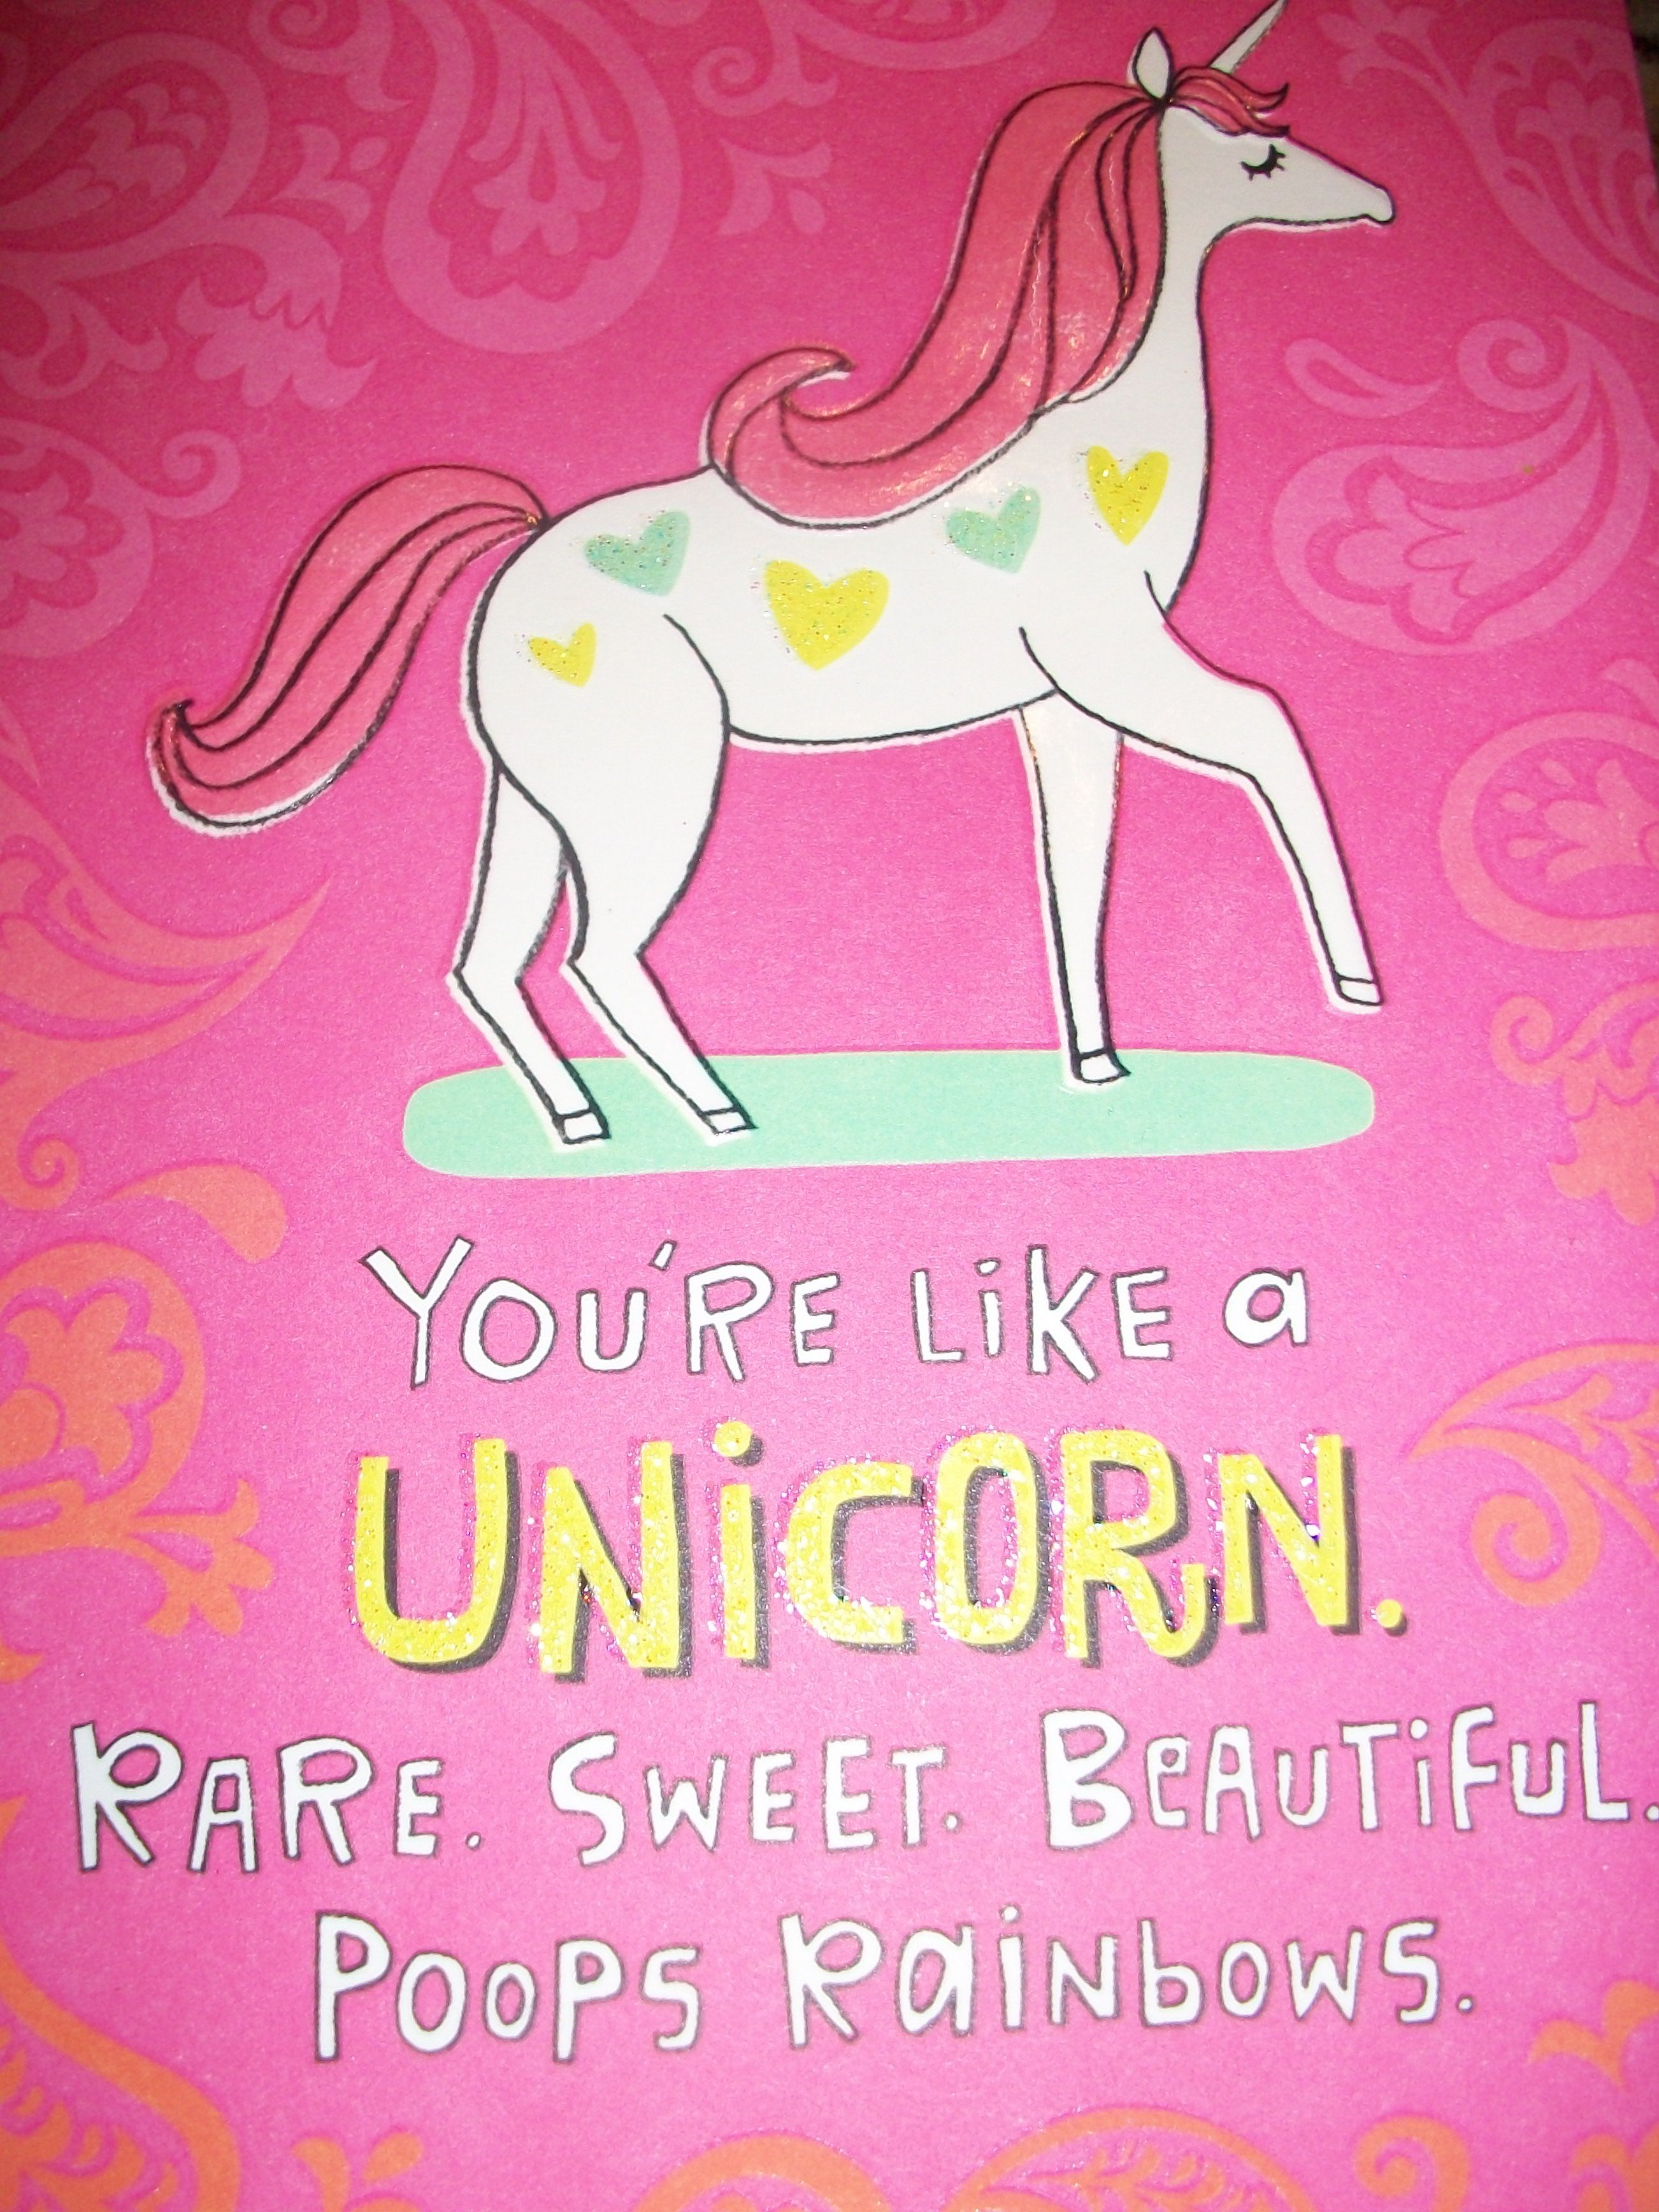 unicorn birthday card google search unicorns pooping